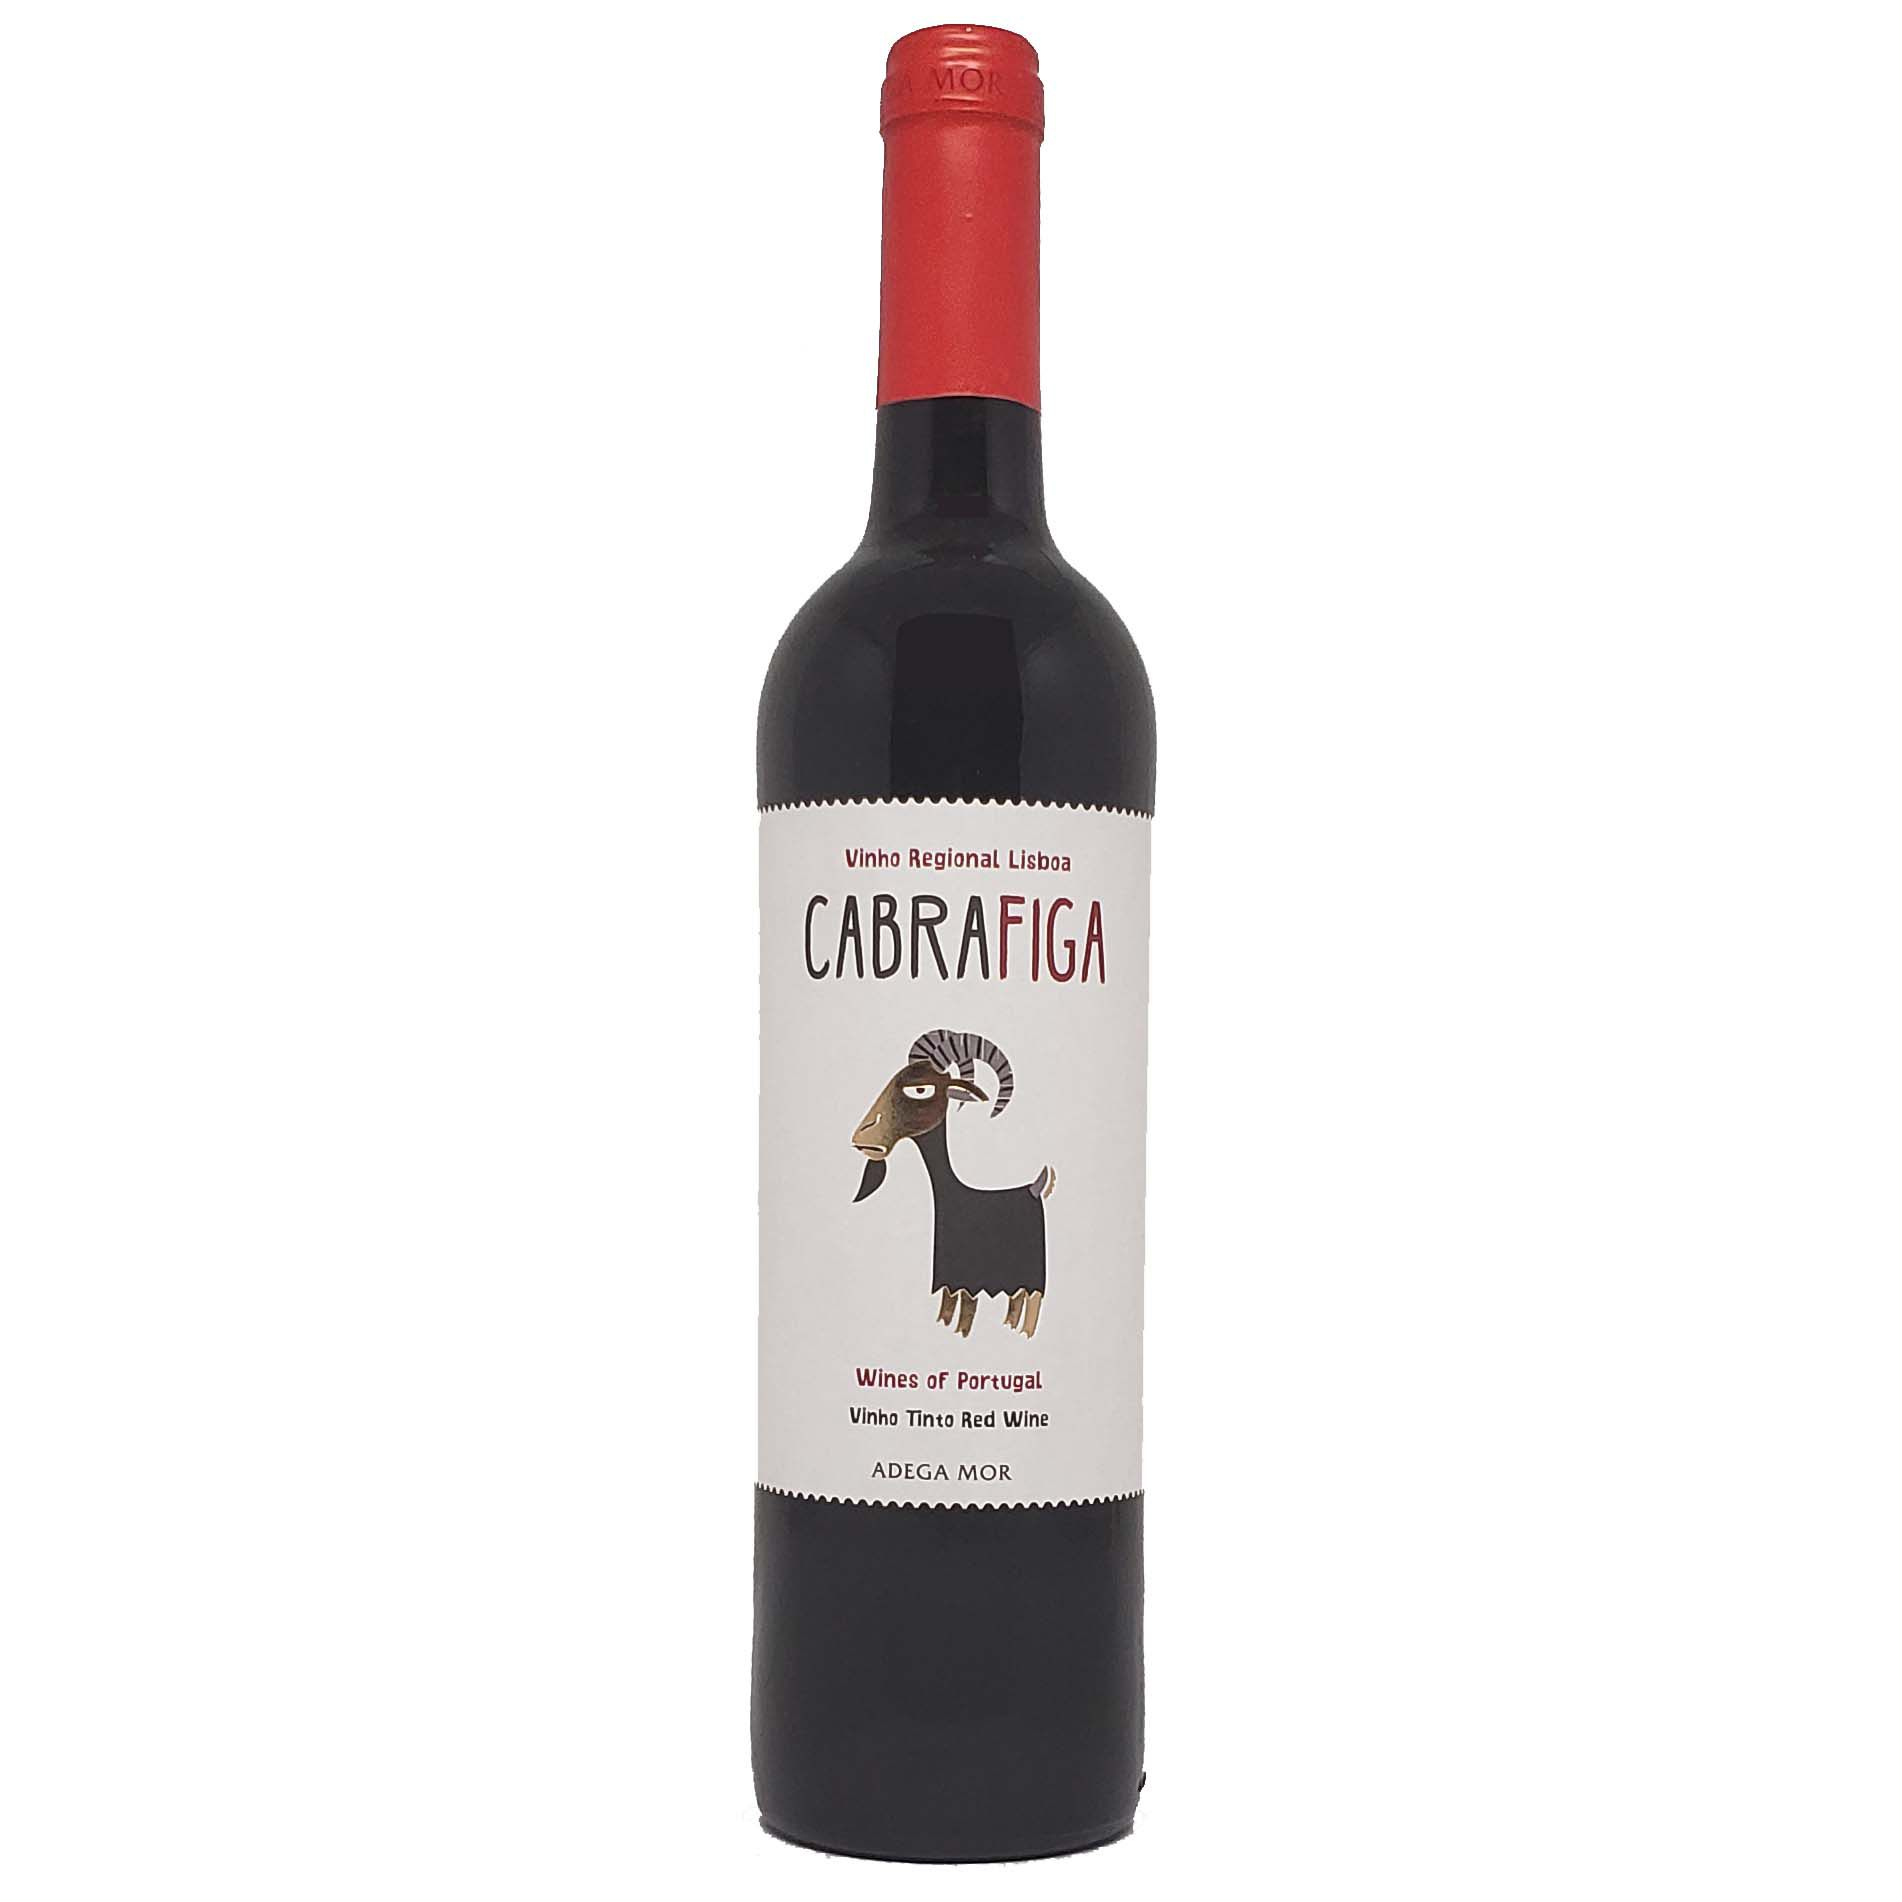 Vinho Tinto Cabrafiga Adega Mor  - 750ML -